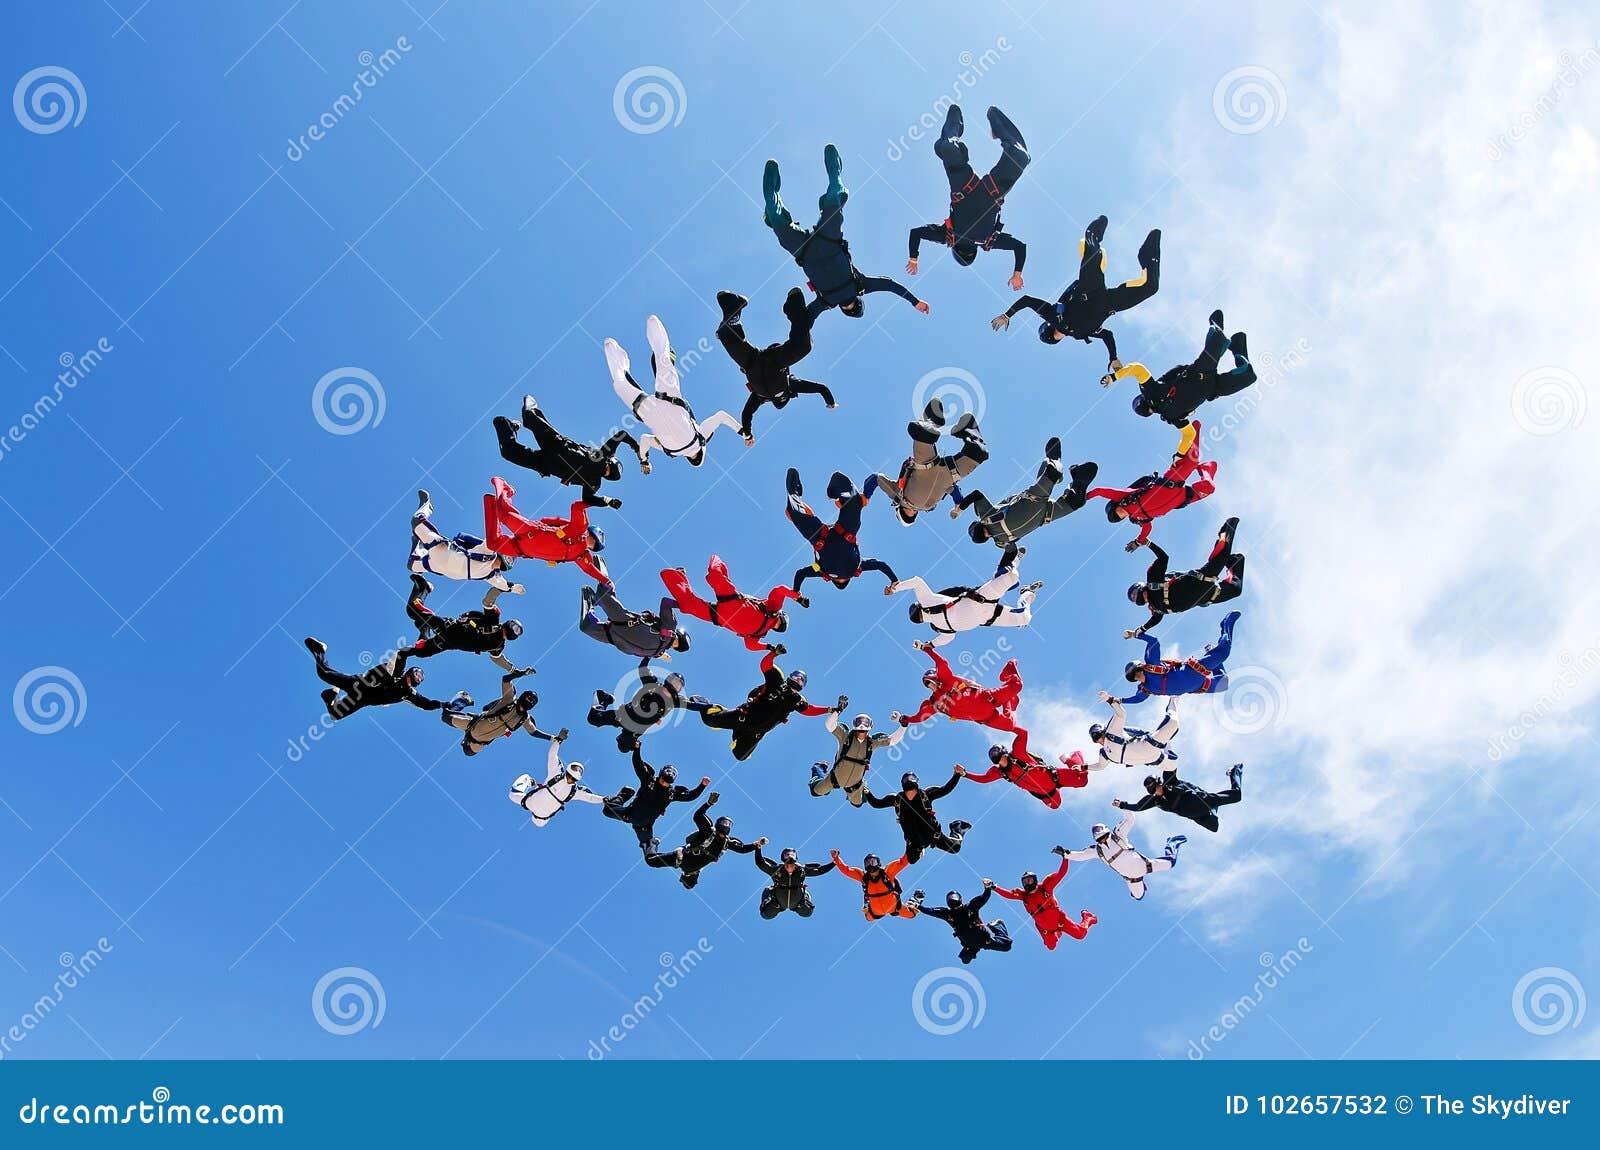 Skydiving队工作低角度视图